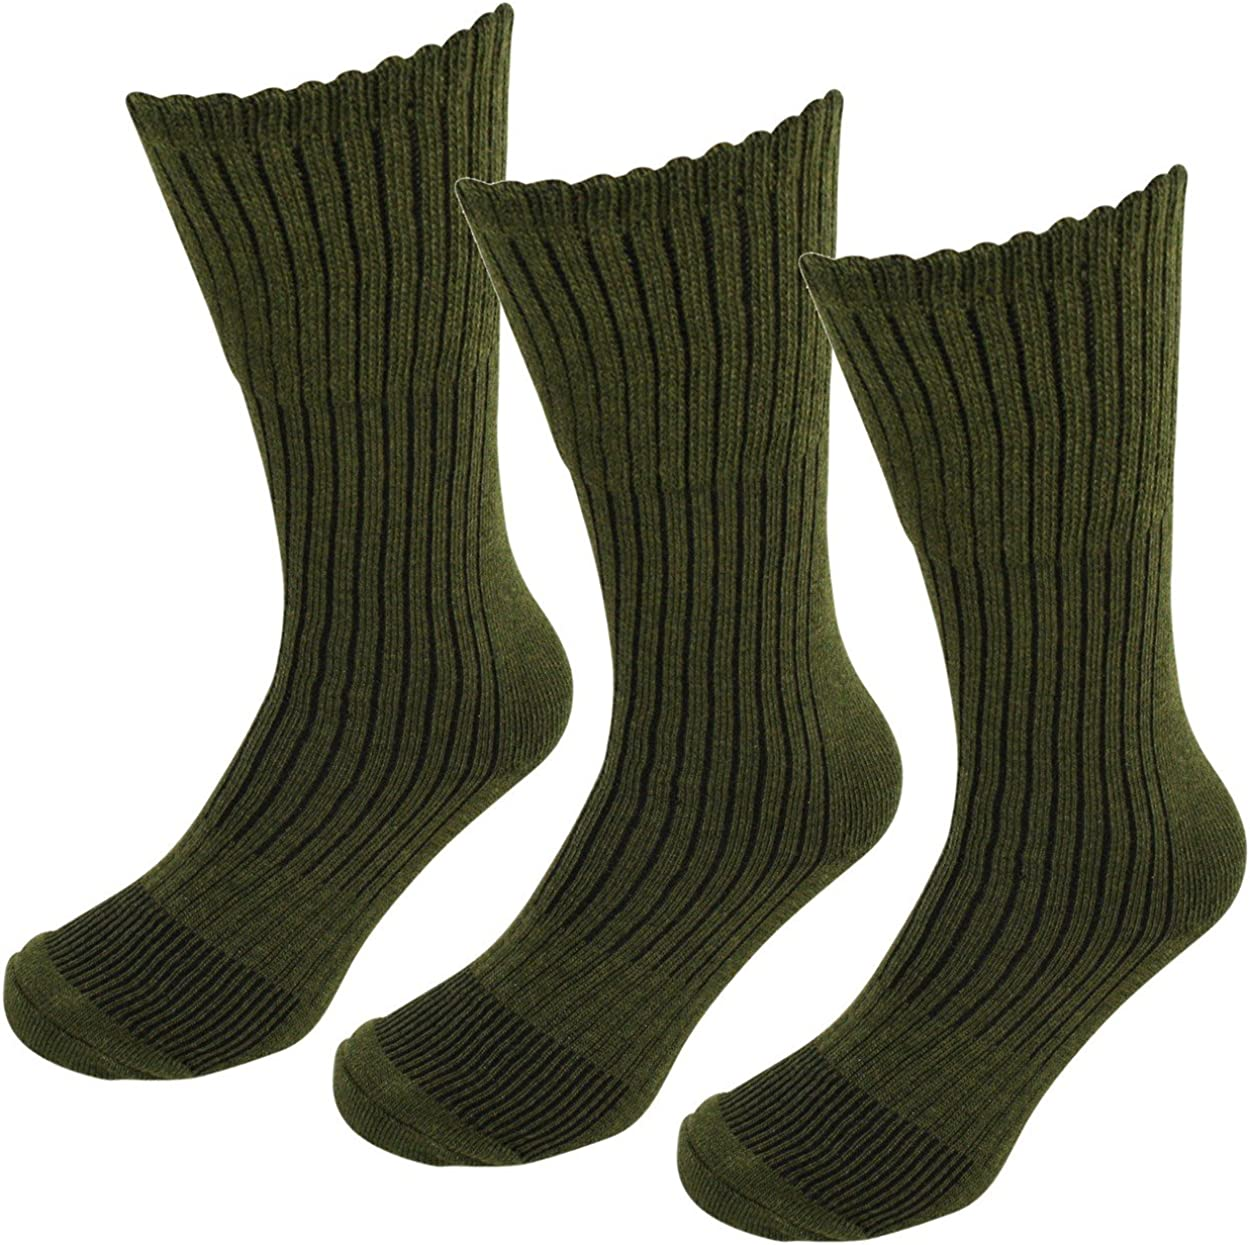 EUR 39-45 3 Pairs Mens Gentle Grip Top High Performance Welly Socks Size UK 6-11